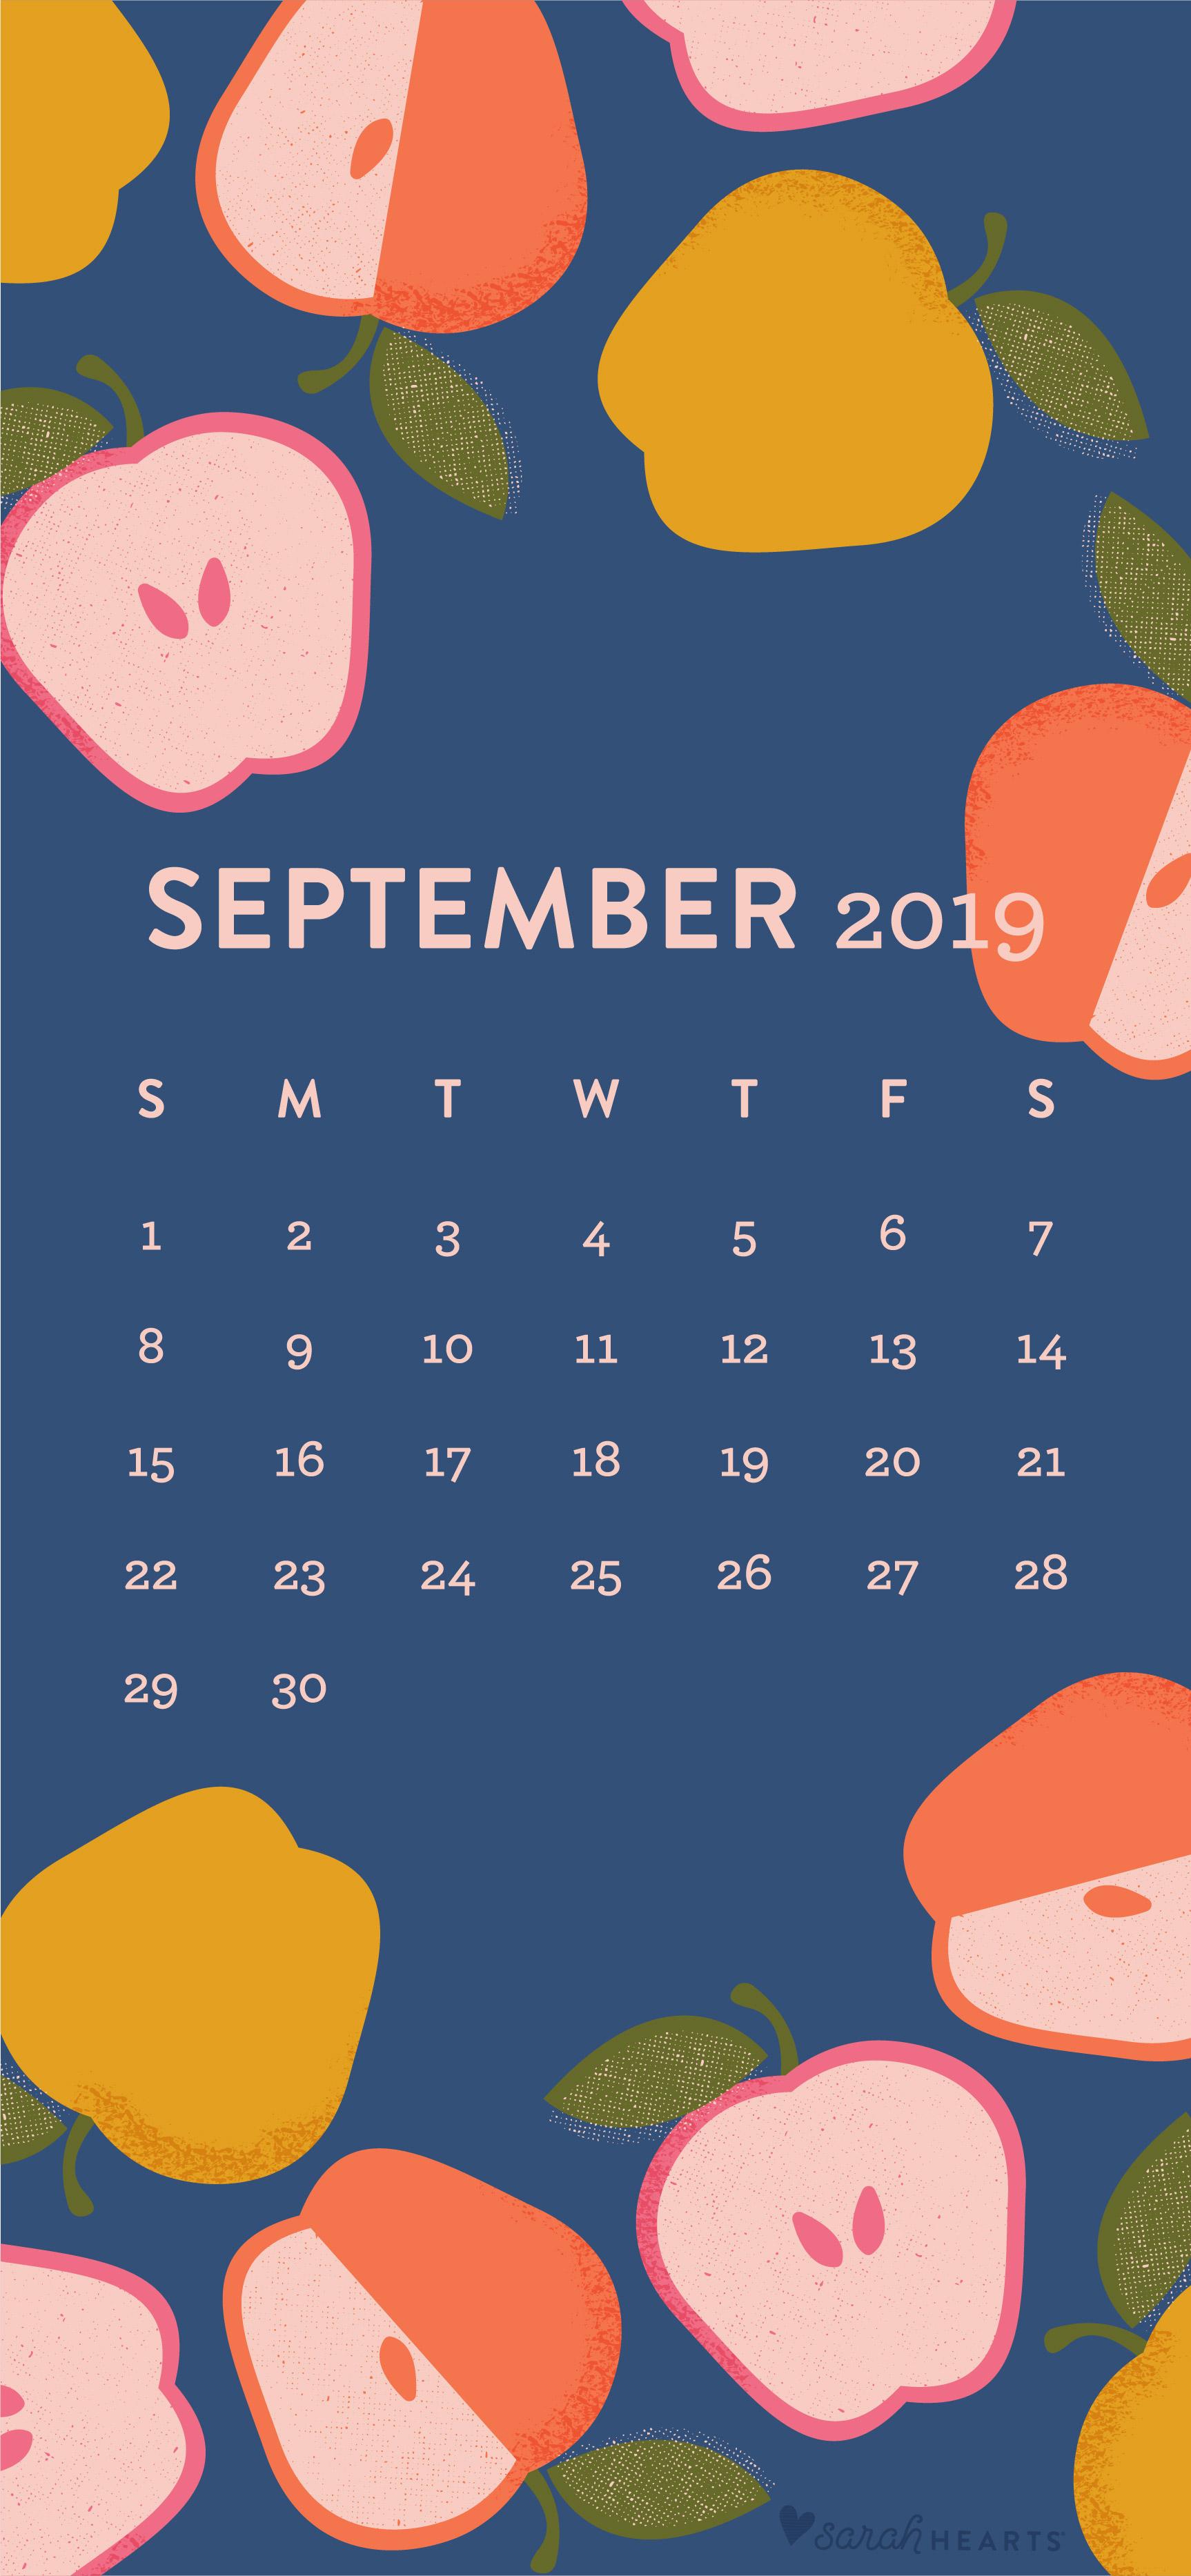 Colorful Apple September 2019 Calendar Wallpaper   Sarah Hearts 1726x3734